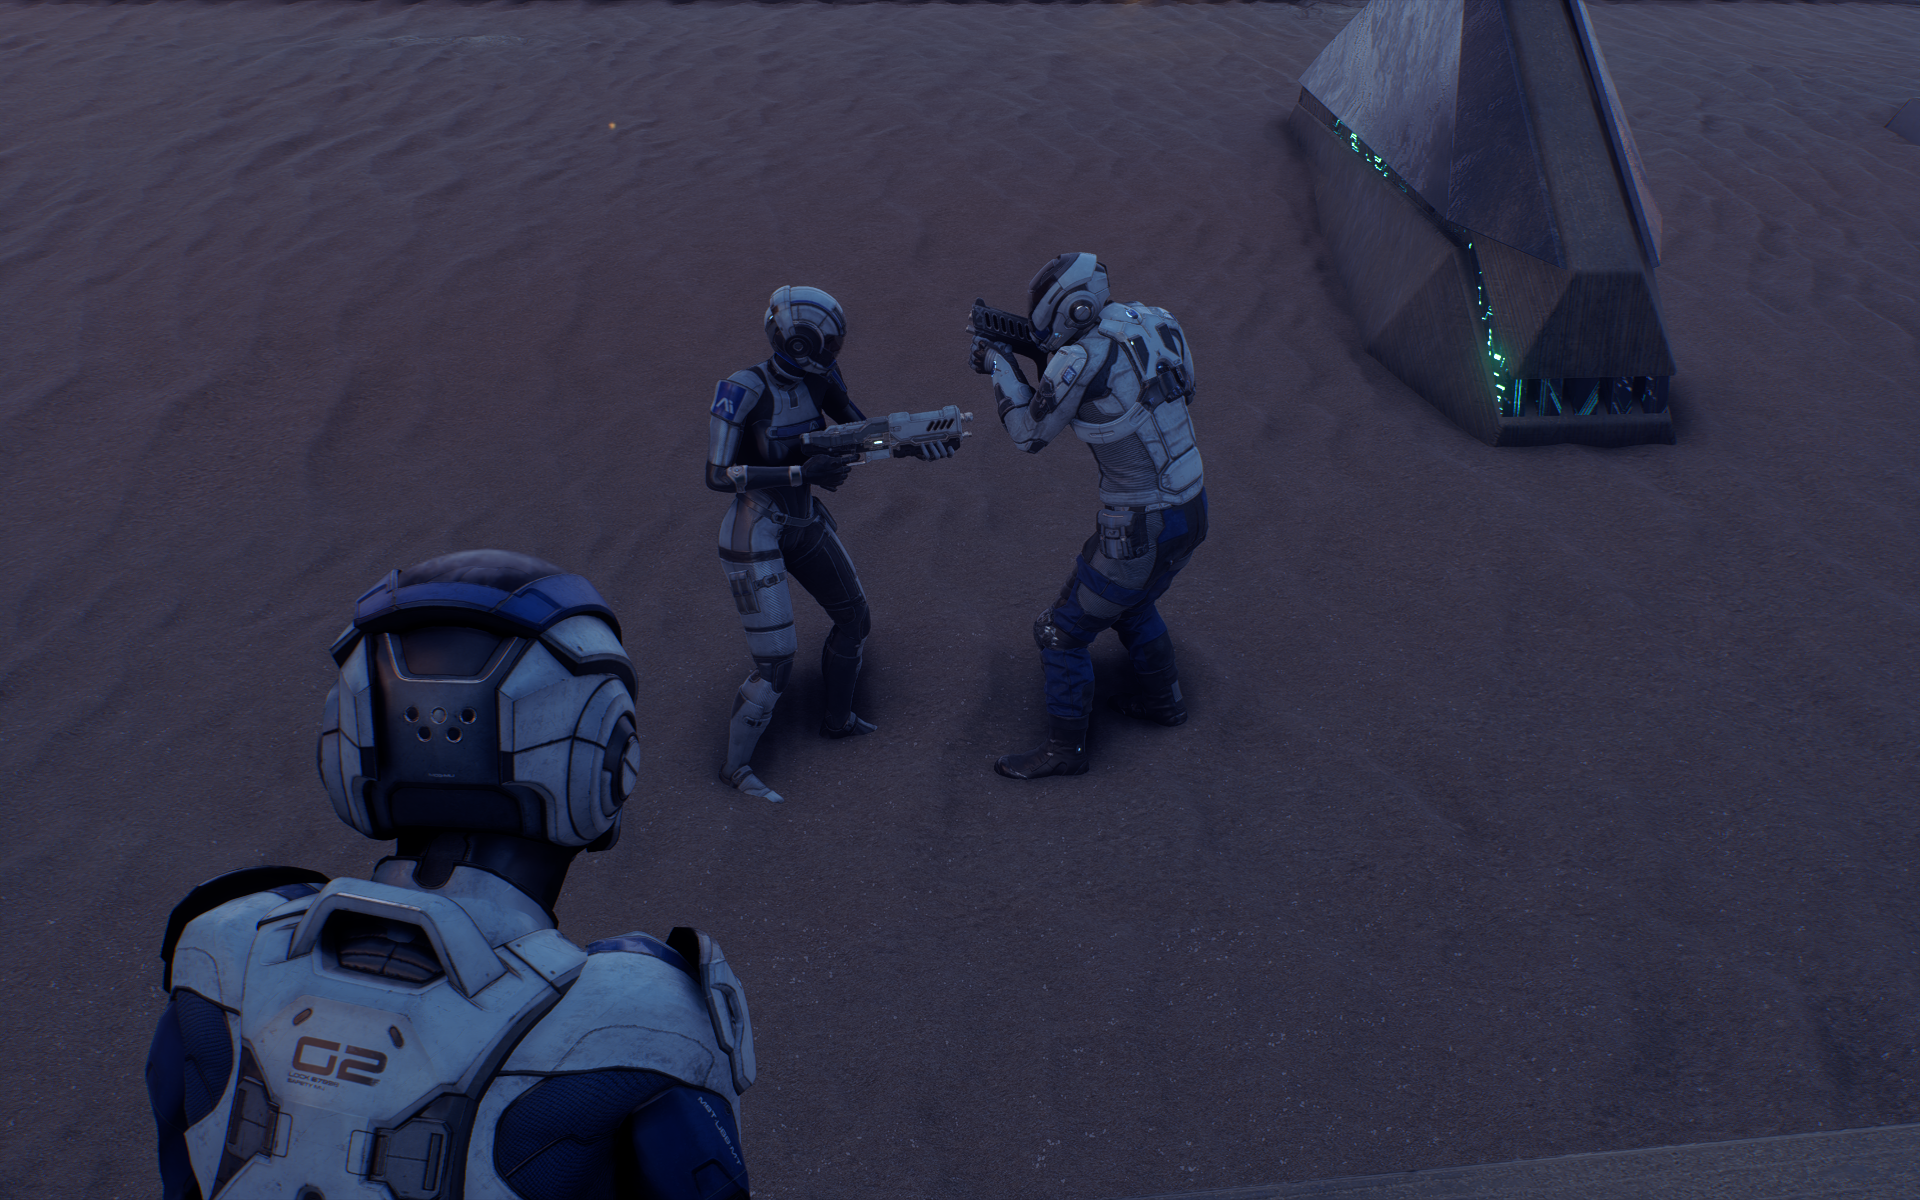 Mass Effect Andromeda Screenshot - 12.26.12.76.png - Mass Effect: Andromeda